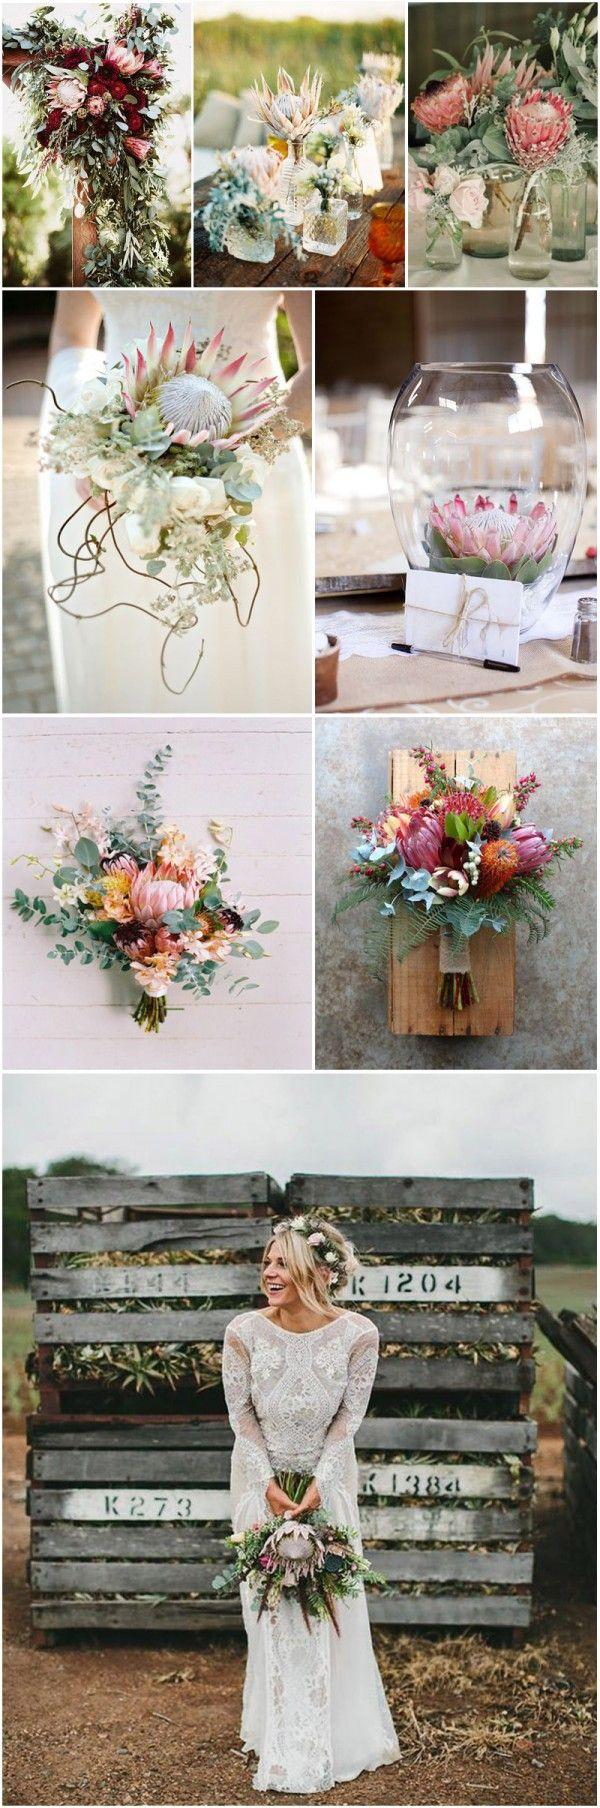 190 best Flowers images on Pinterest   Casamento, Wedding bouquets ...